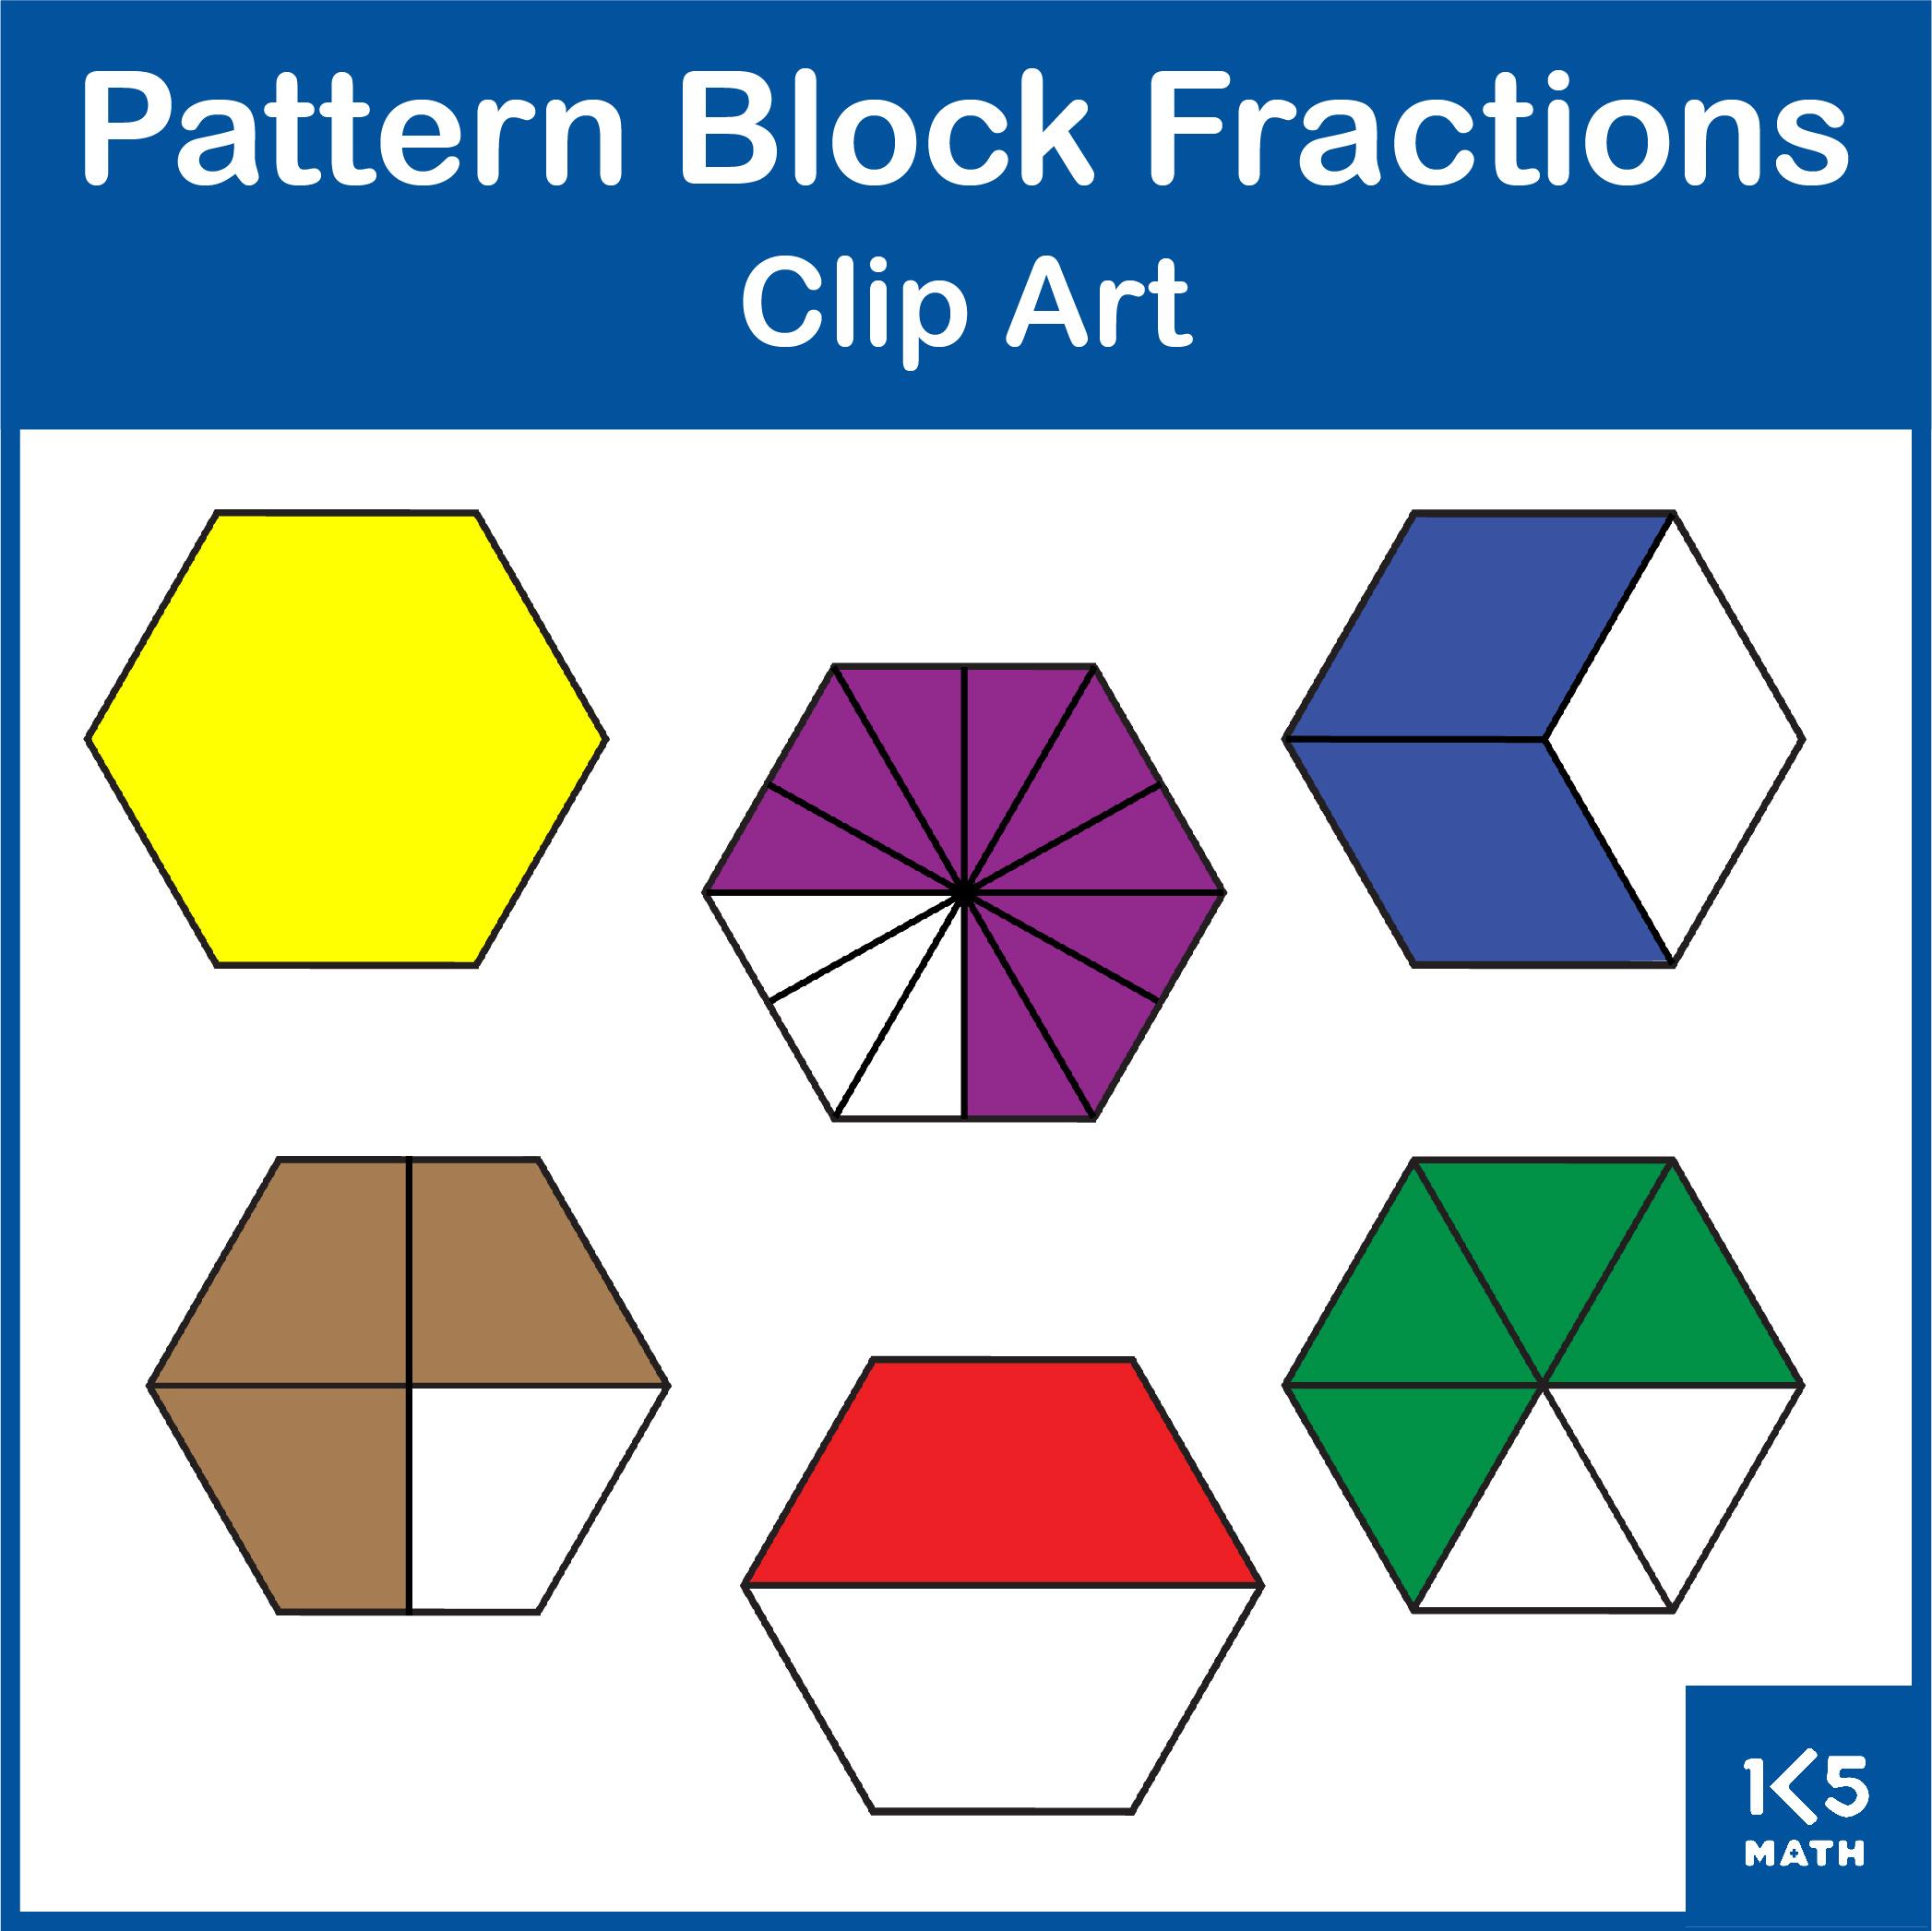 Pattern Block Fractions Clip Art